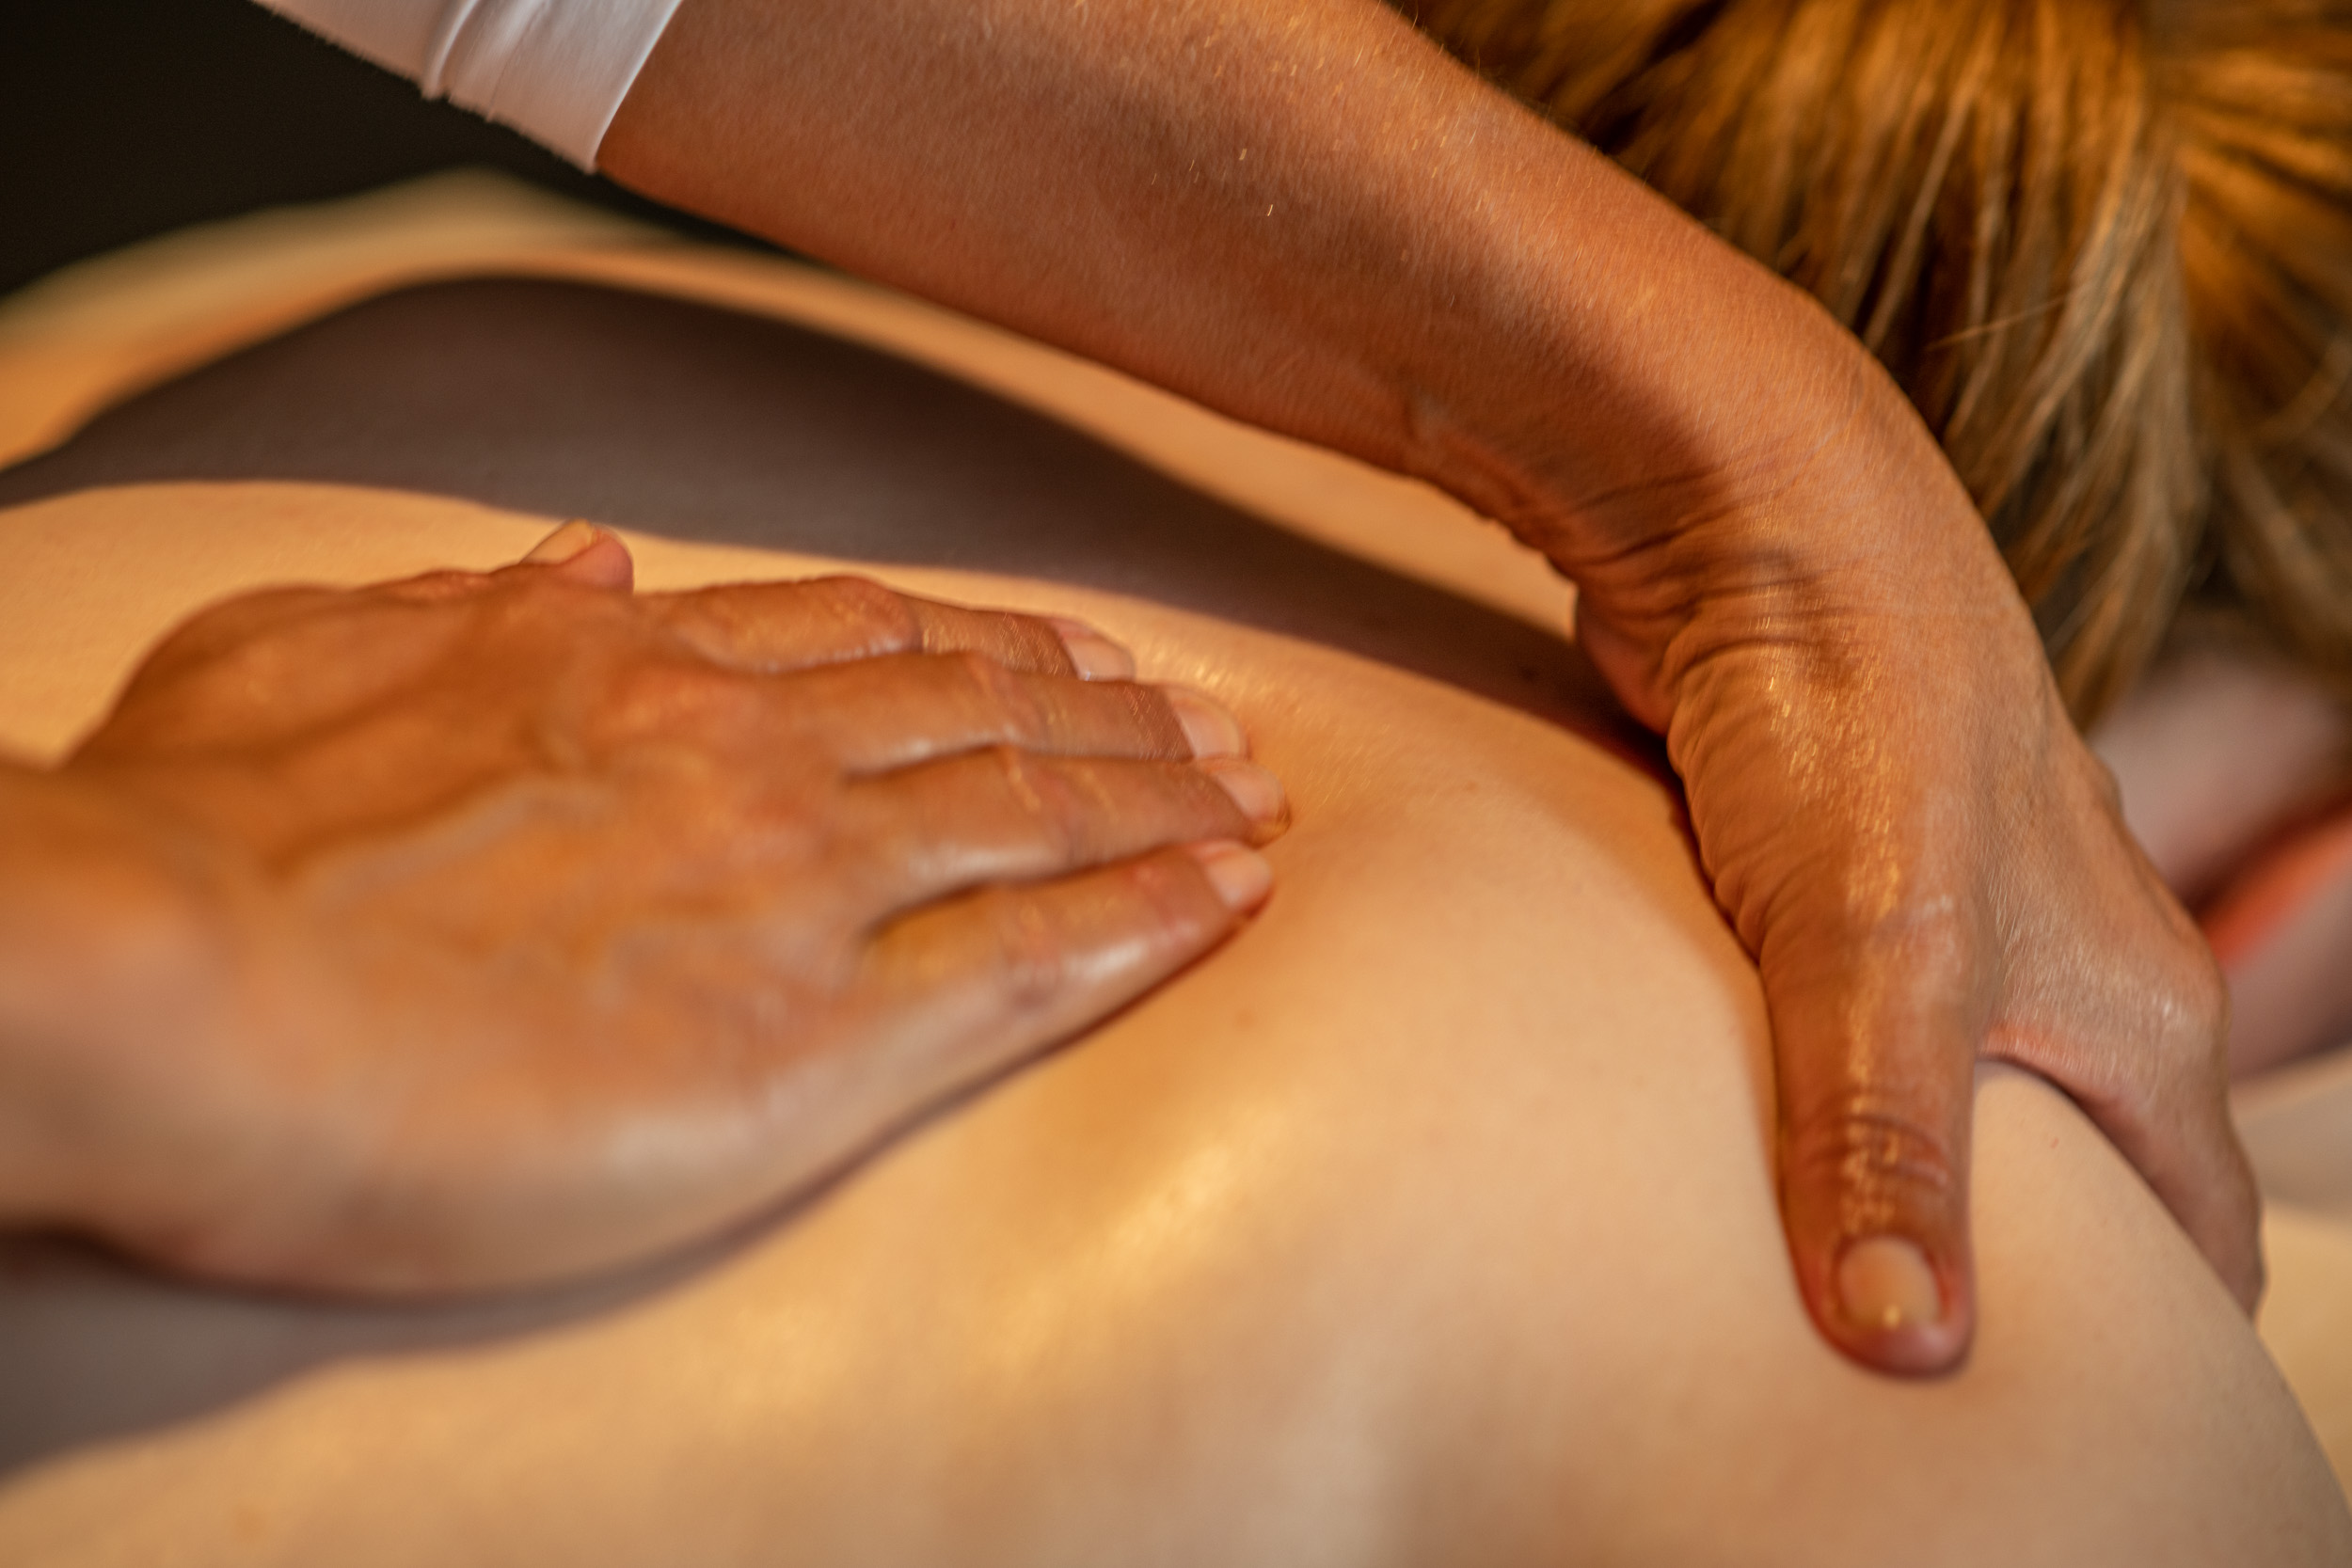 Massage therapy @ NLI Wellness Spa